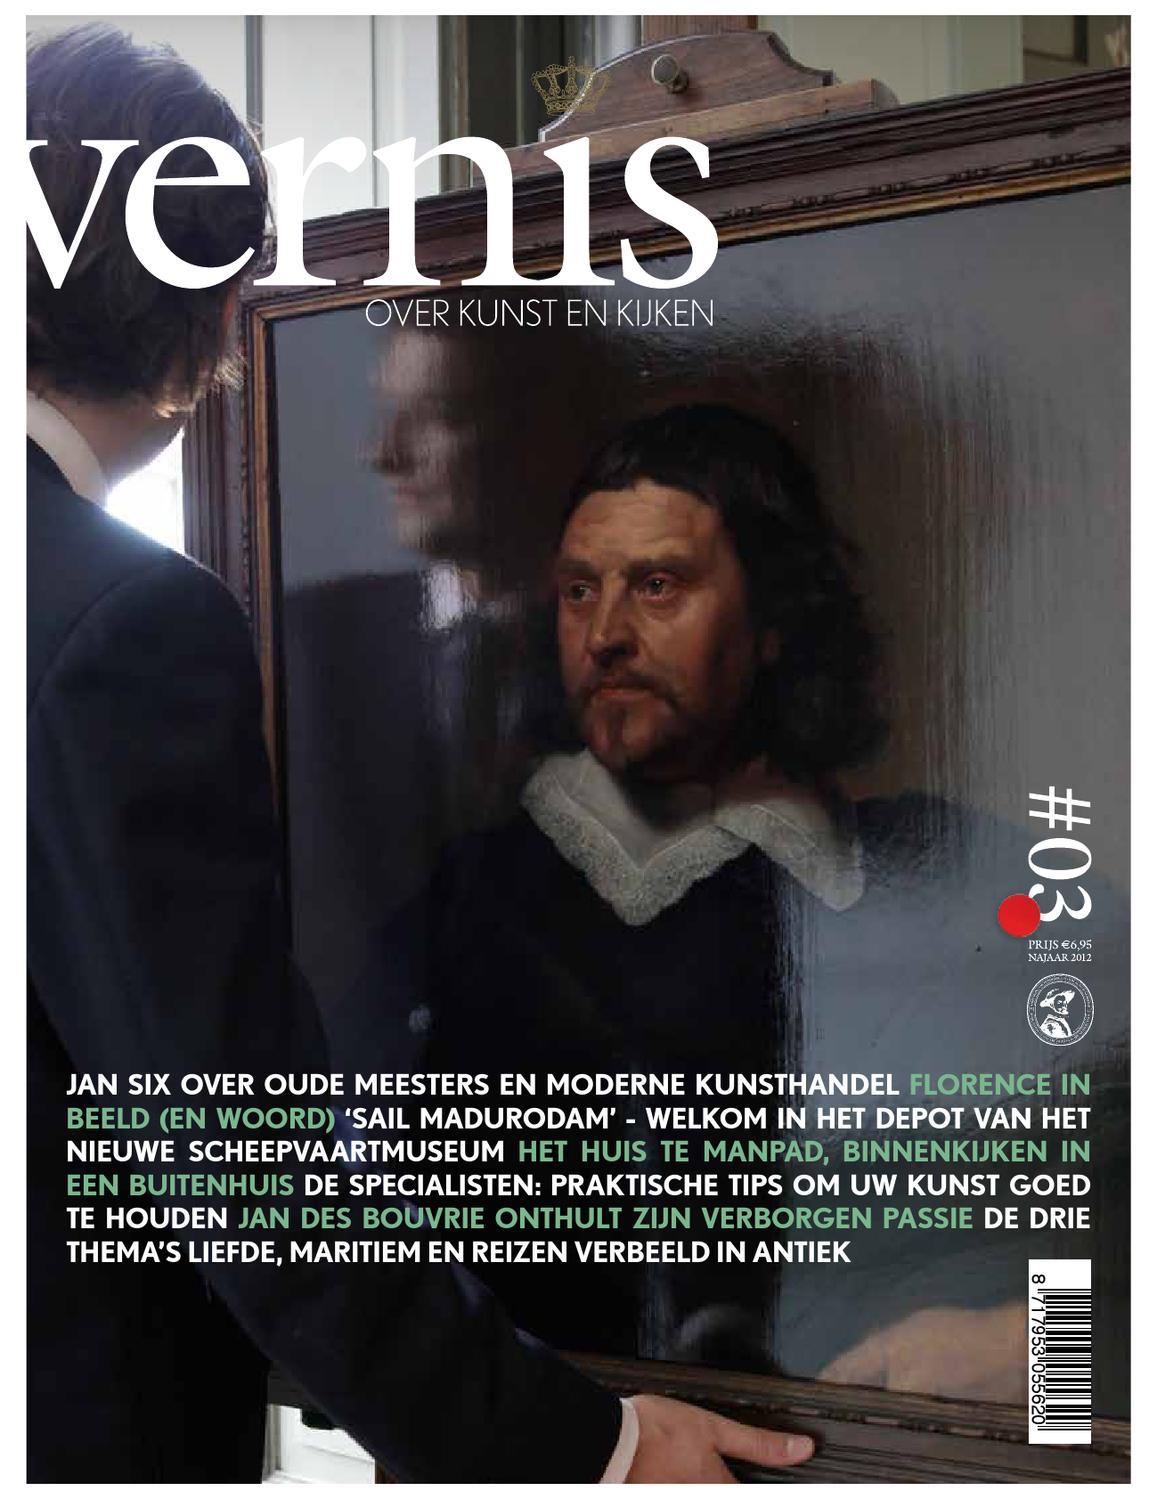 Vernis magazine, edition#6 by koninklijke vhok   issuu